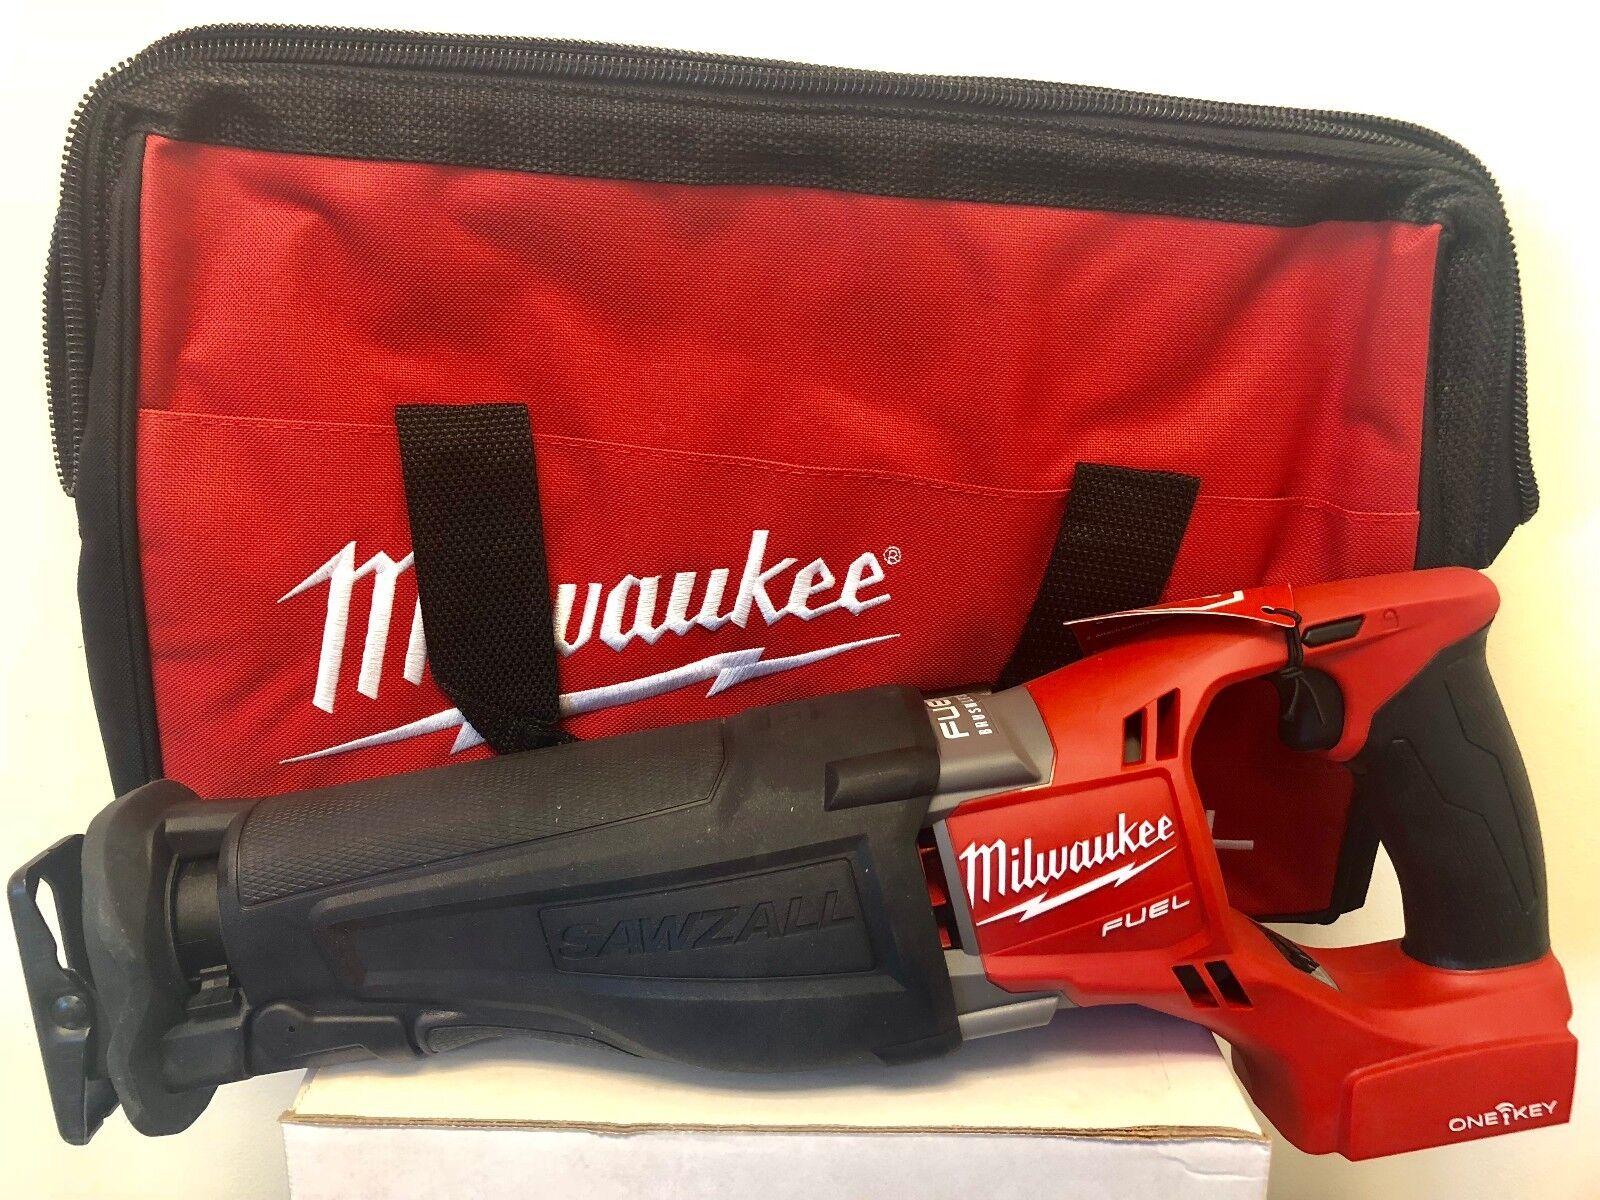 MILWAUKEE 2721-20 M18 FUEL Reciprocating Sawzall One Key + FREE MED TOOL BAG